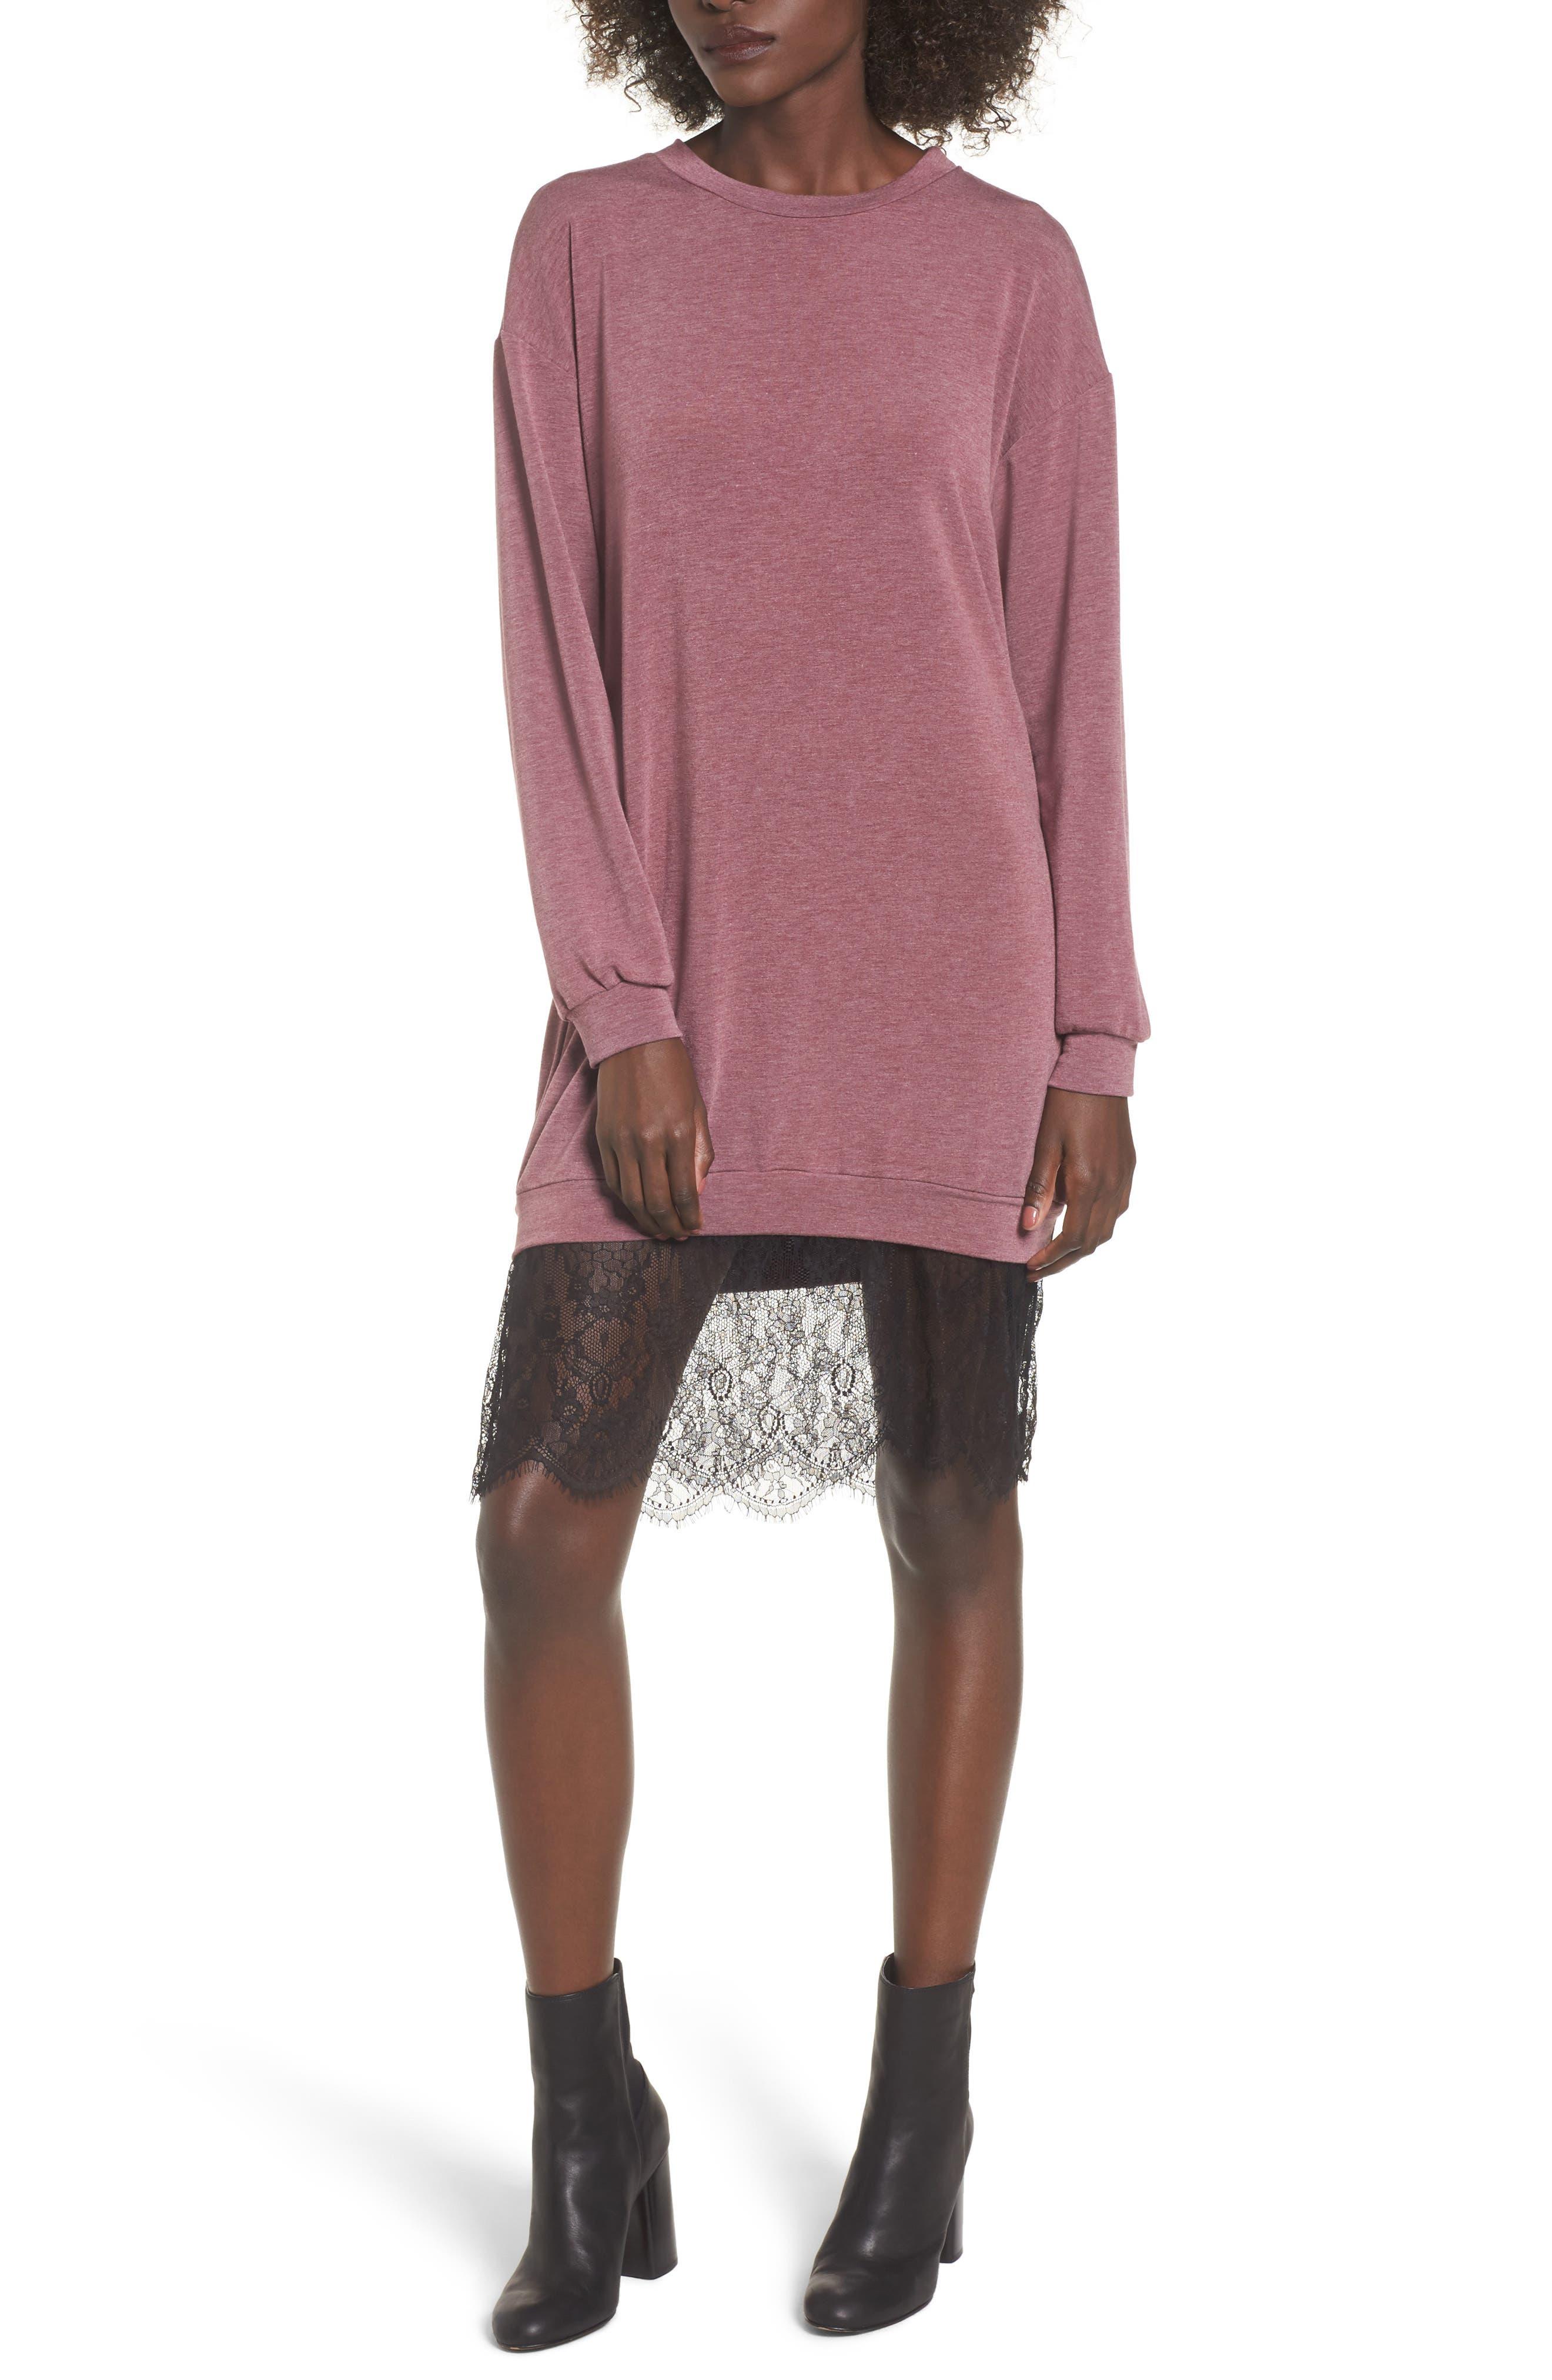 Main Image - Lace Hem Sweatshirt Dress